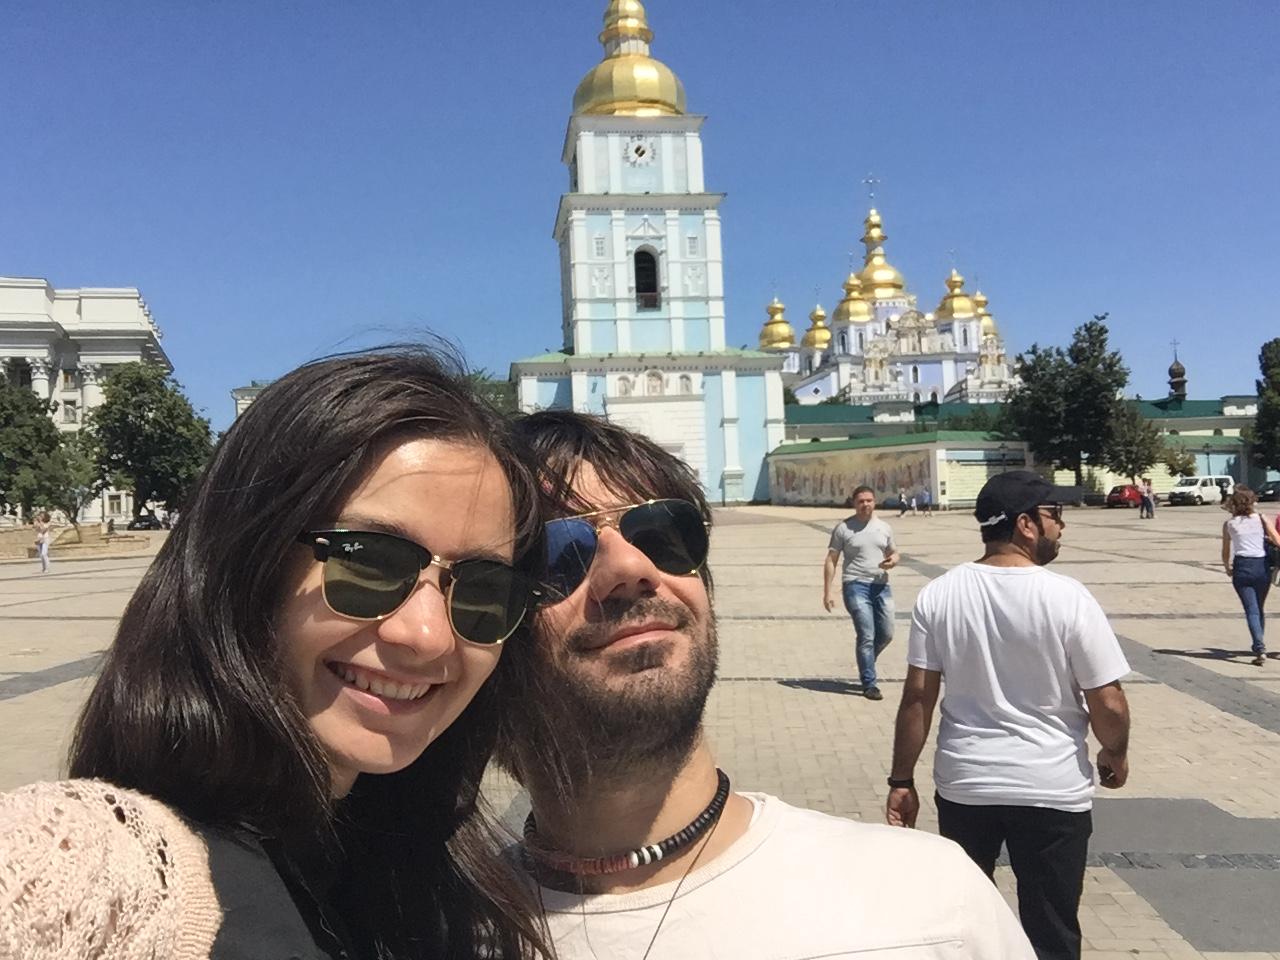 Kiev - 7 - Olga & me